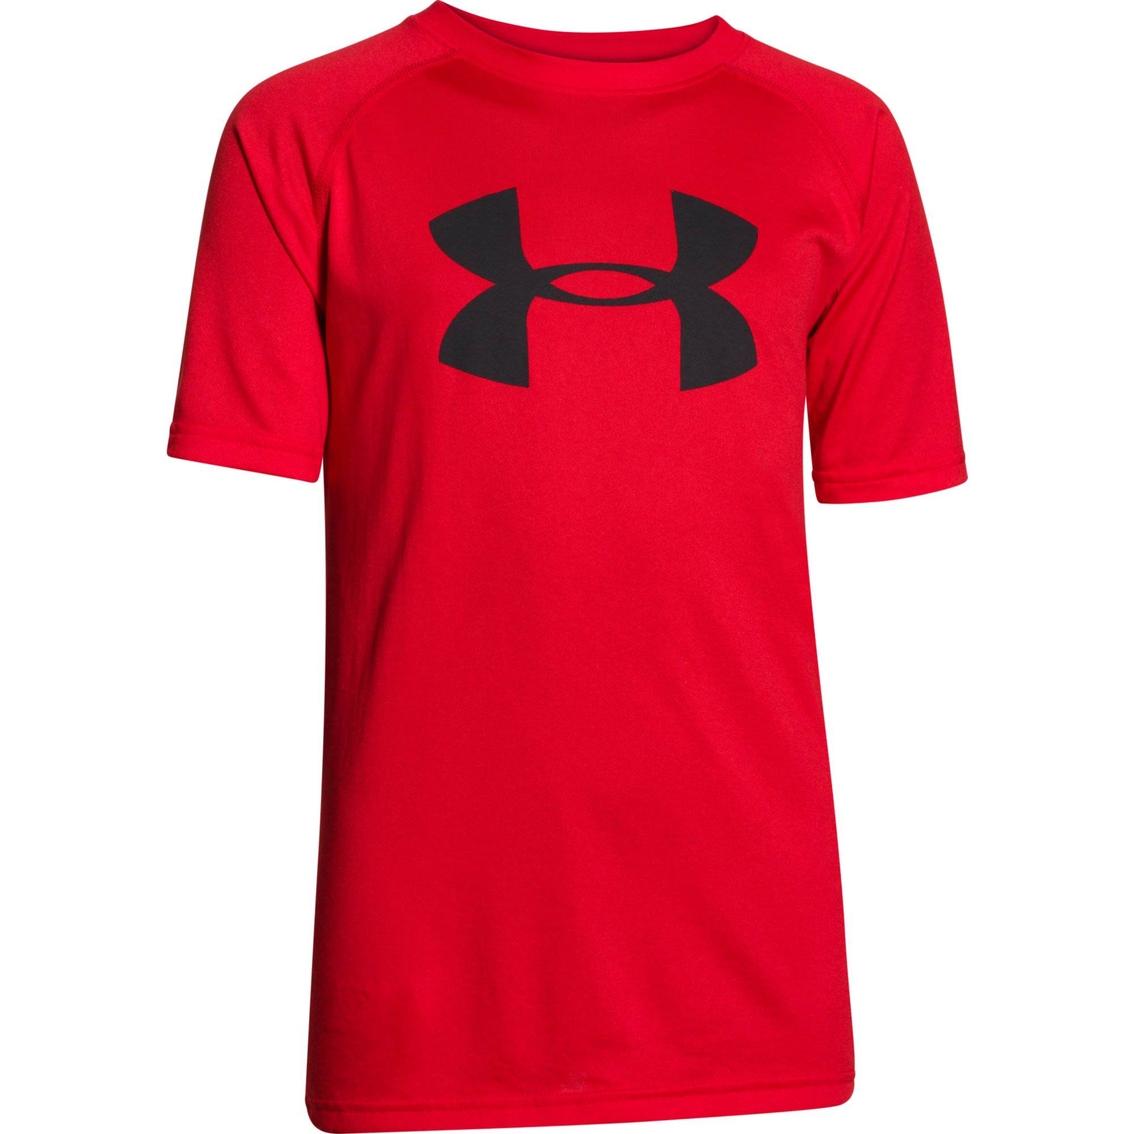 Under armour boys big logo ua tech tee shirts tees for Under armour shirts for kids